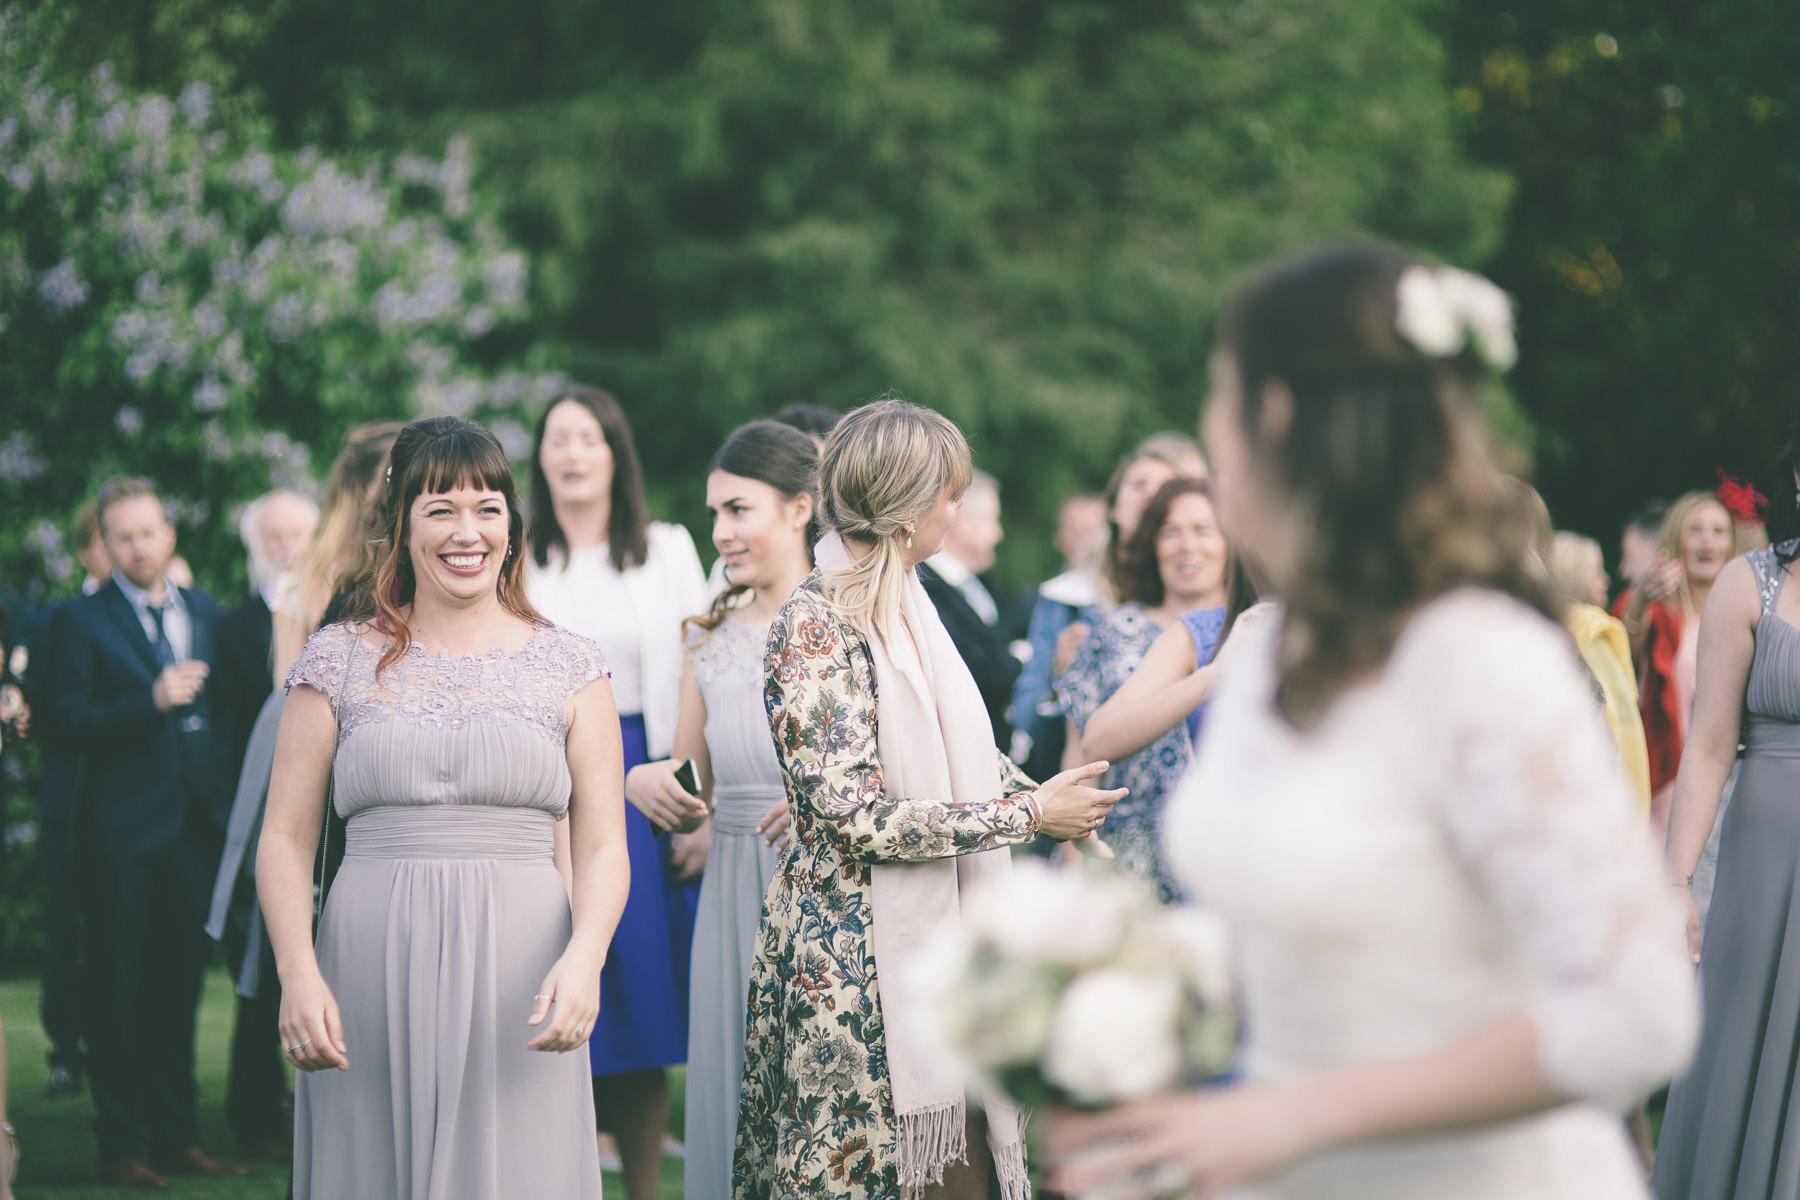 Pamber-Place-wedding-photography-basingstoke-hampshire-207